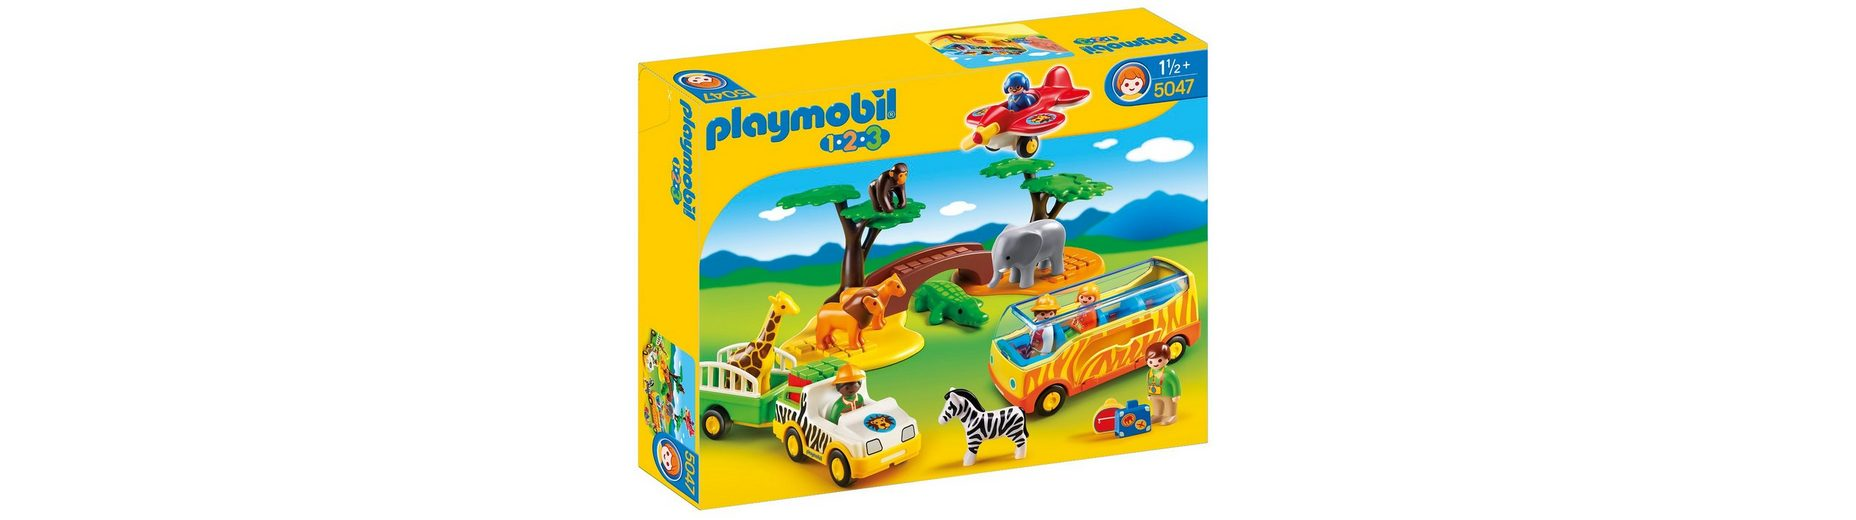 Playmobil® Große Afrika-Safari (5047), Playmobil 1-2-3